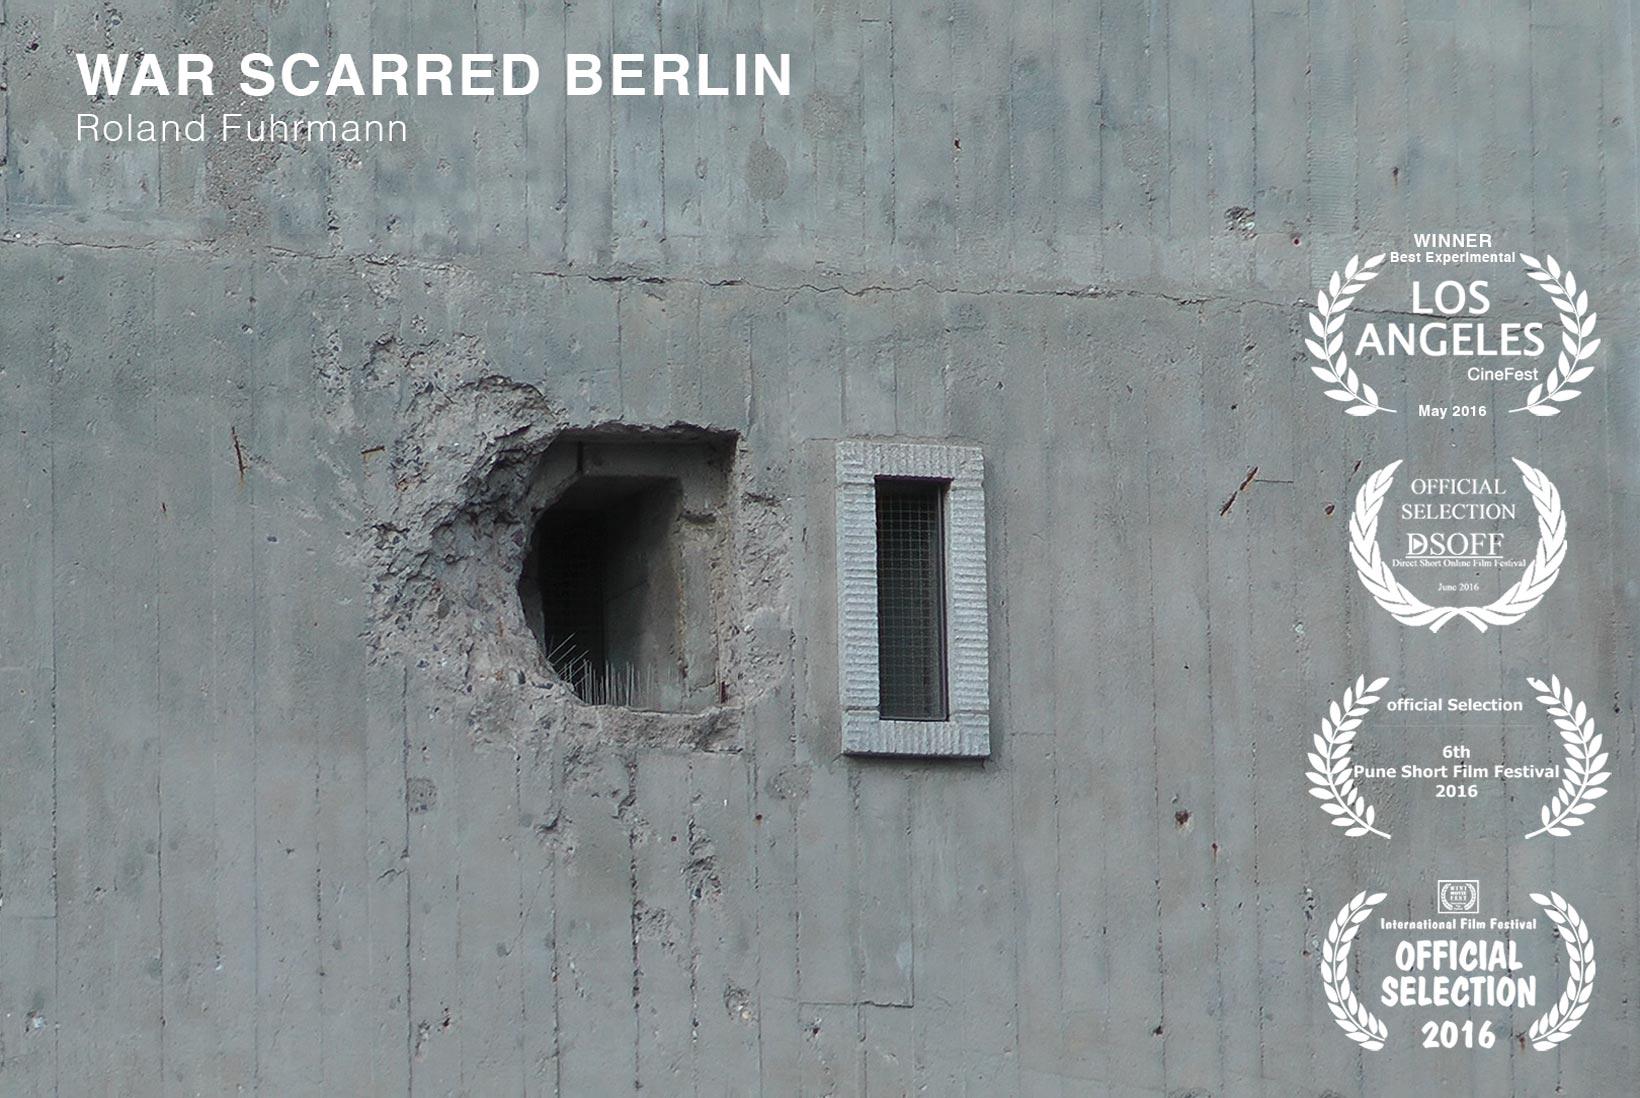 WAR SCARRED BERLIN, Roland Fuhrmann